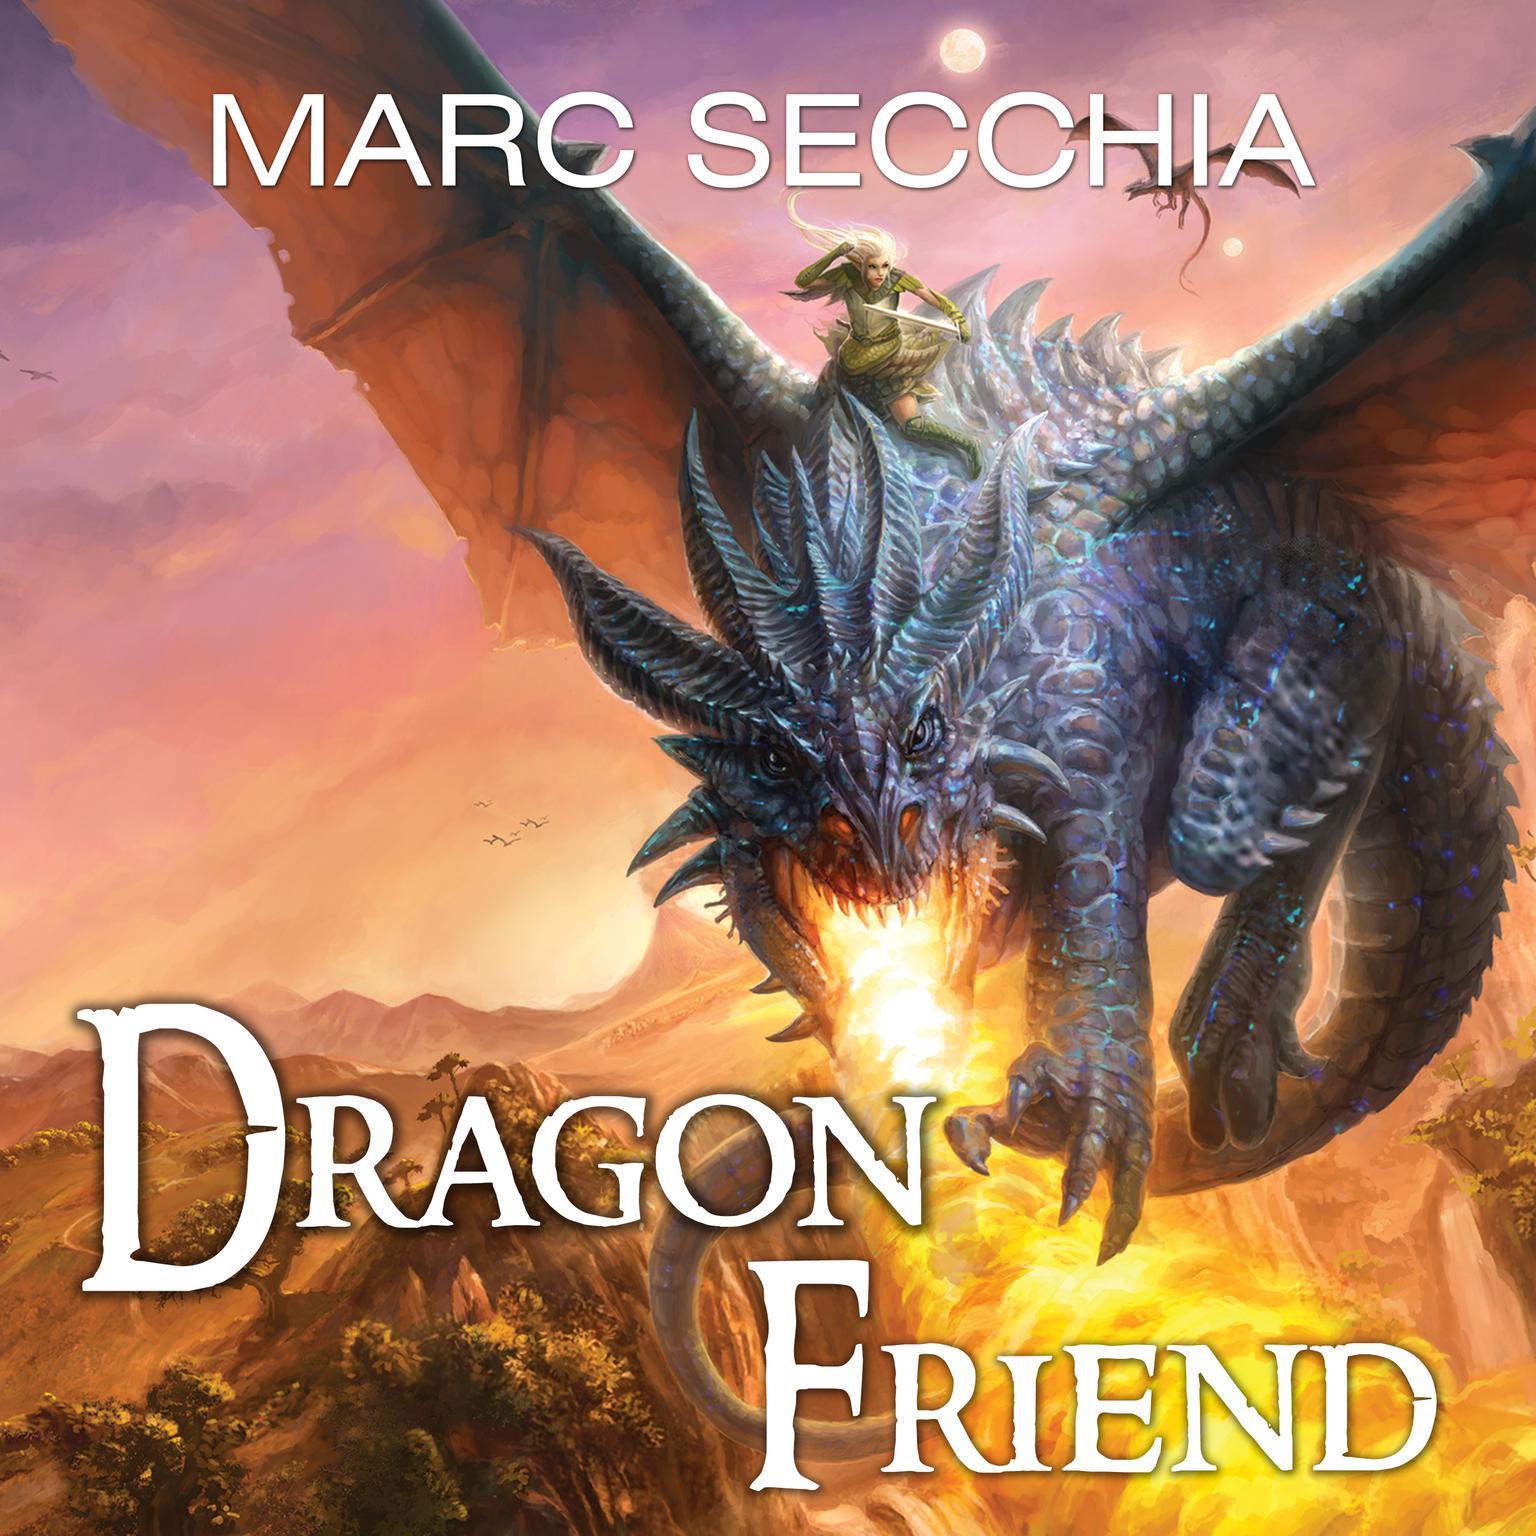 Dragonfriend Audiobook, by Marc Secchia